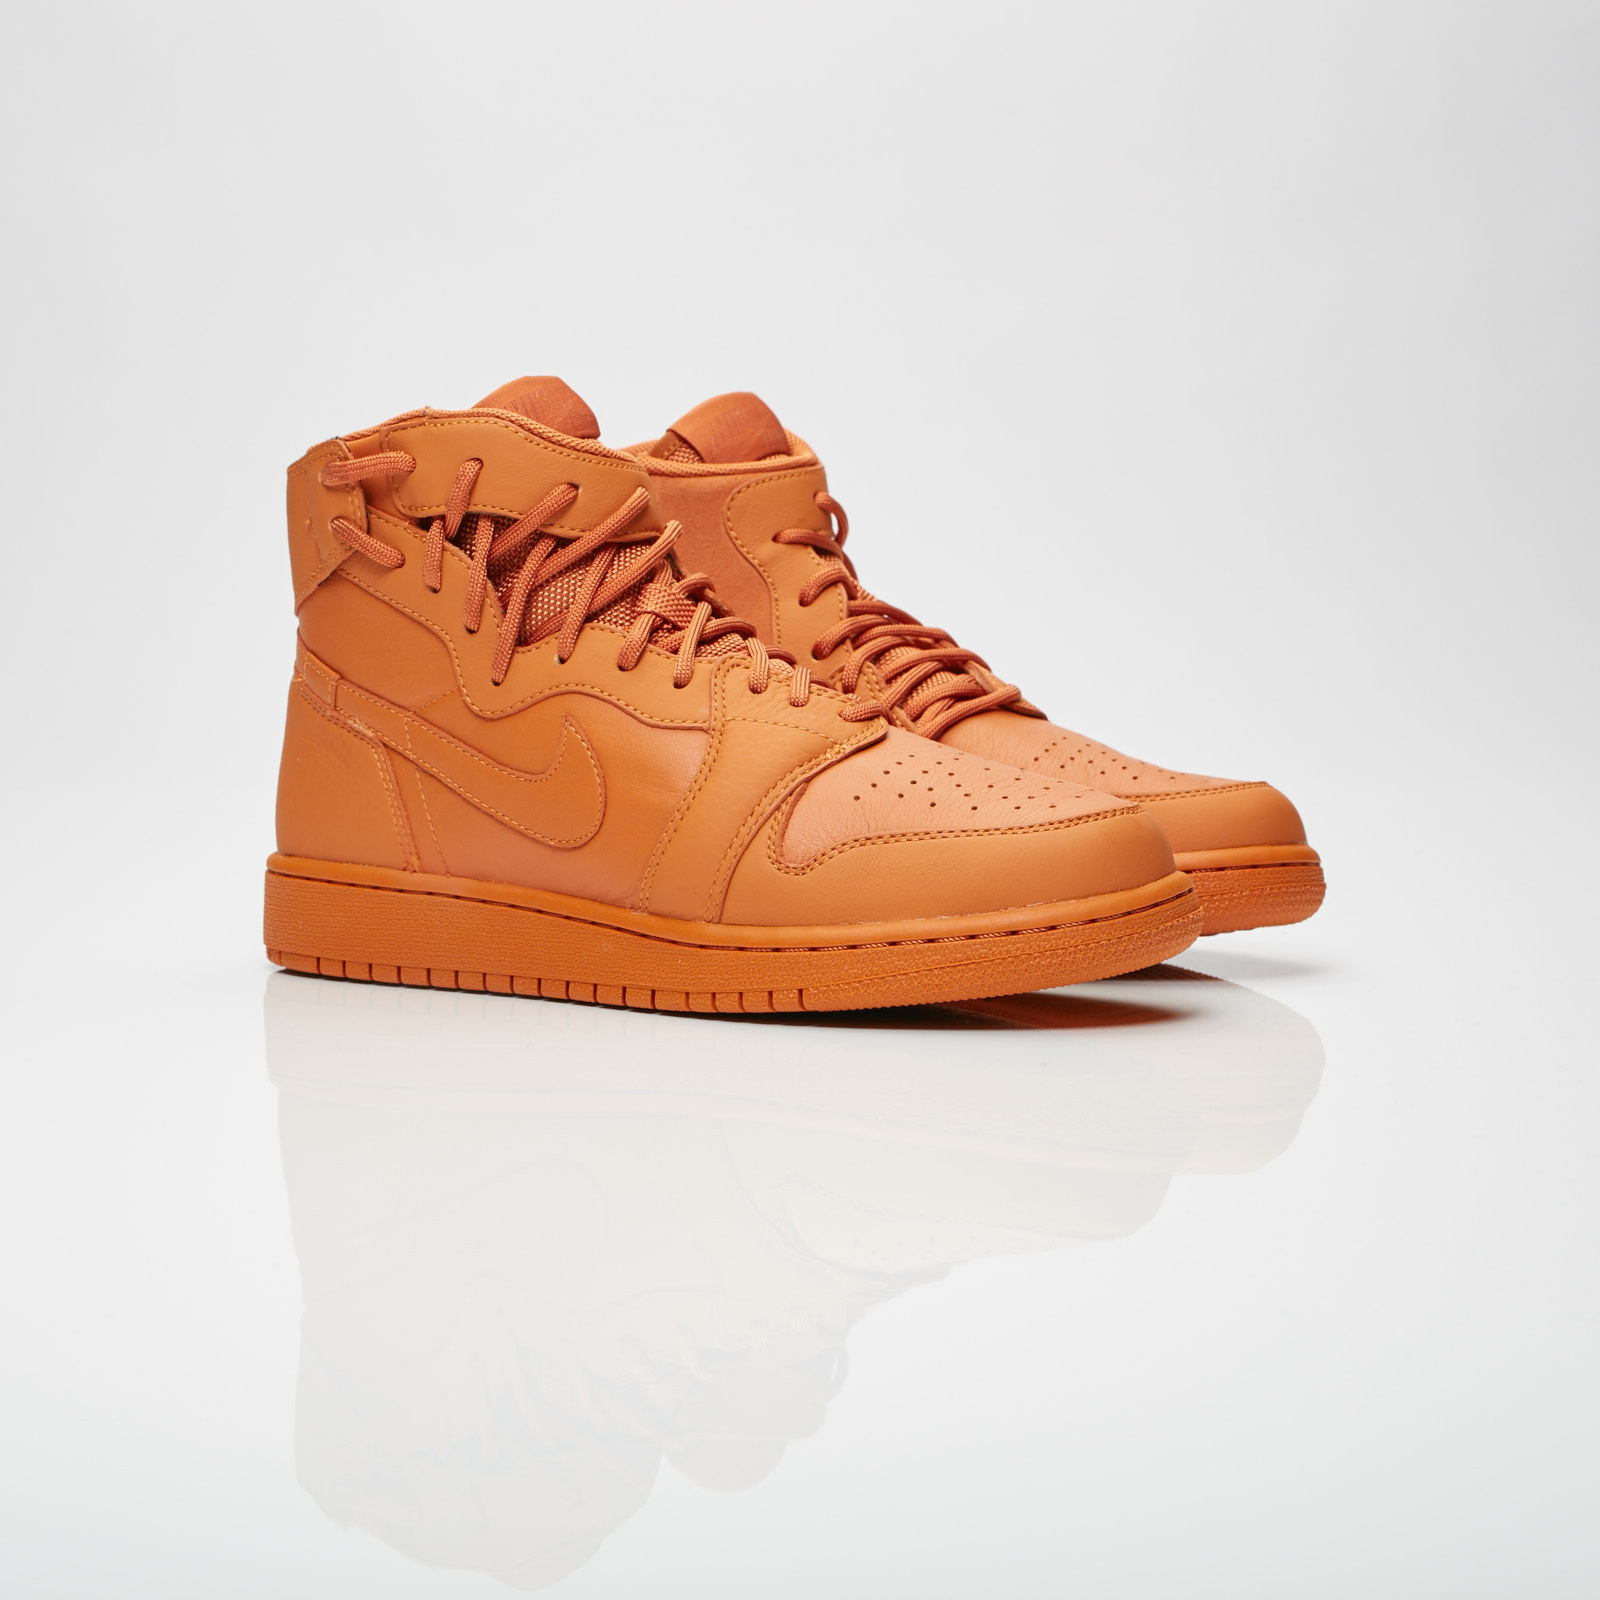 Jordan Brand Wmns Air Jordan 1 Rebel XX